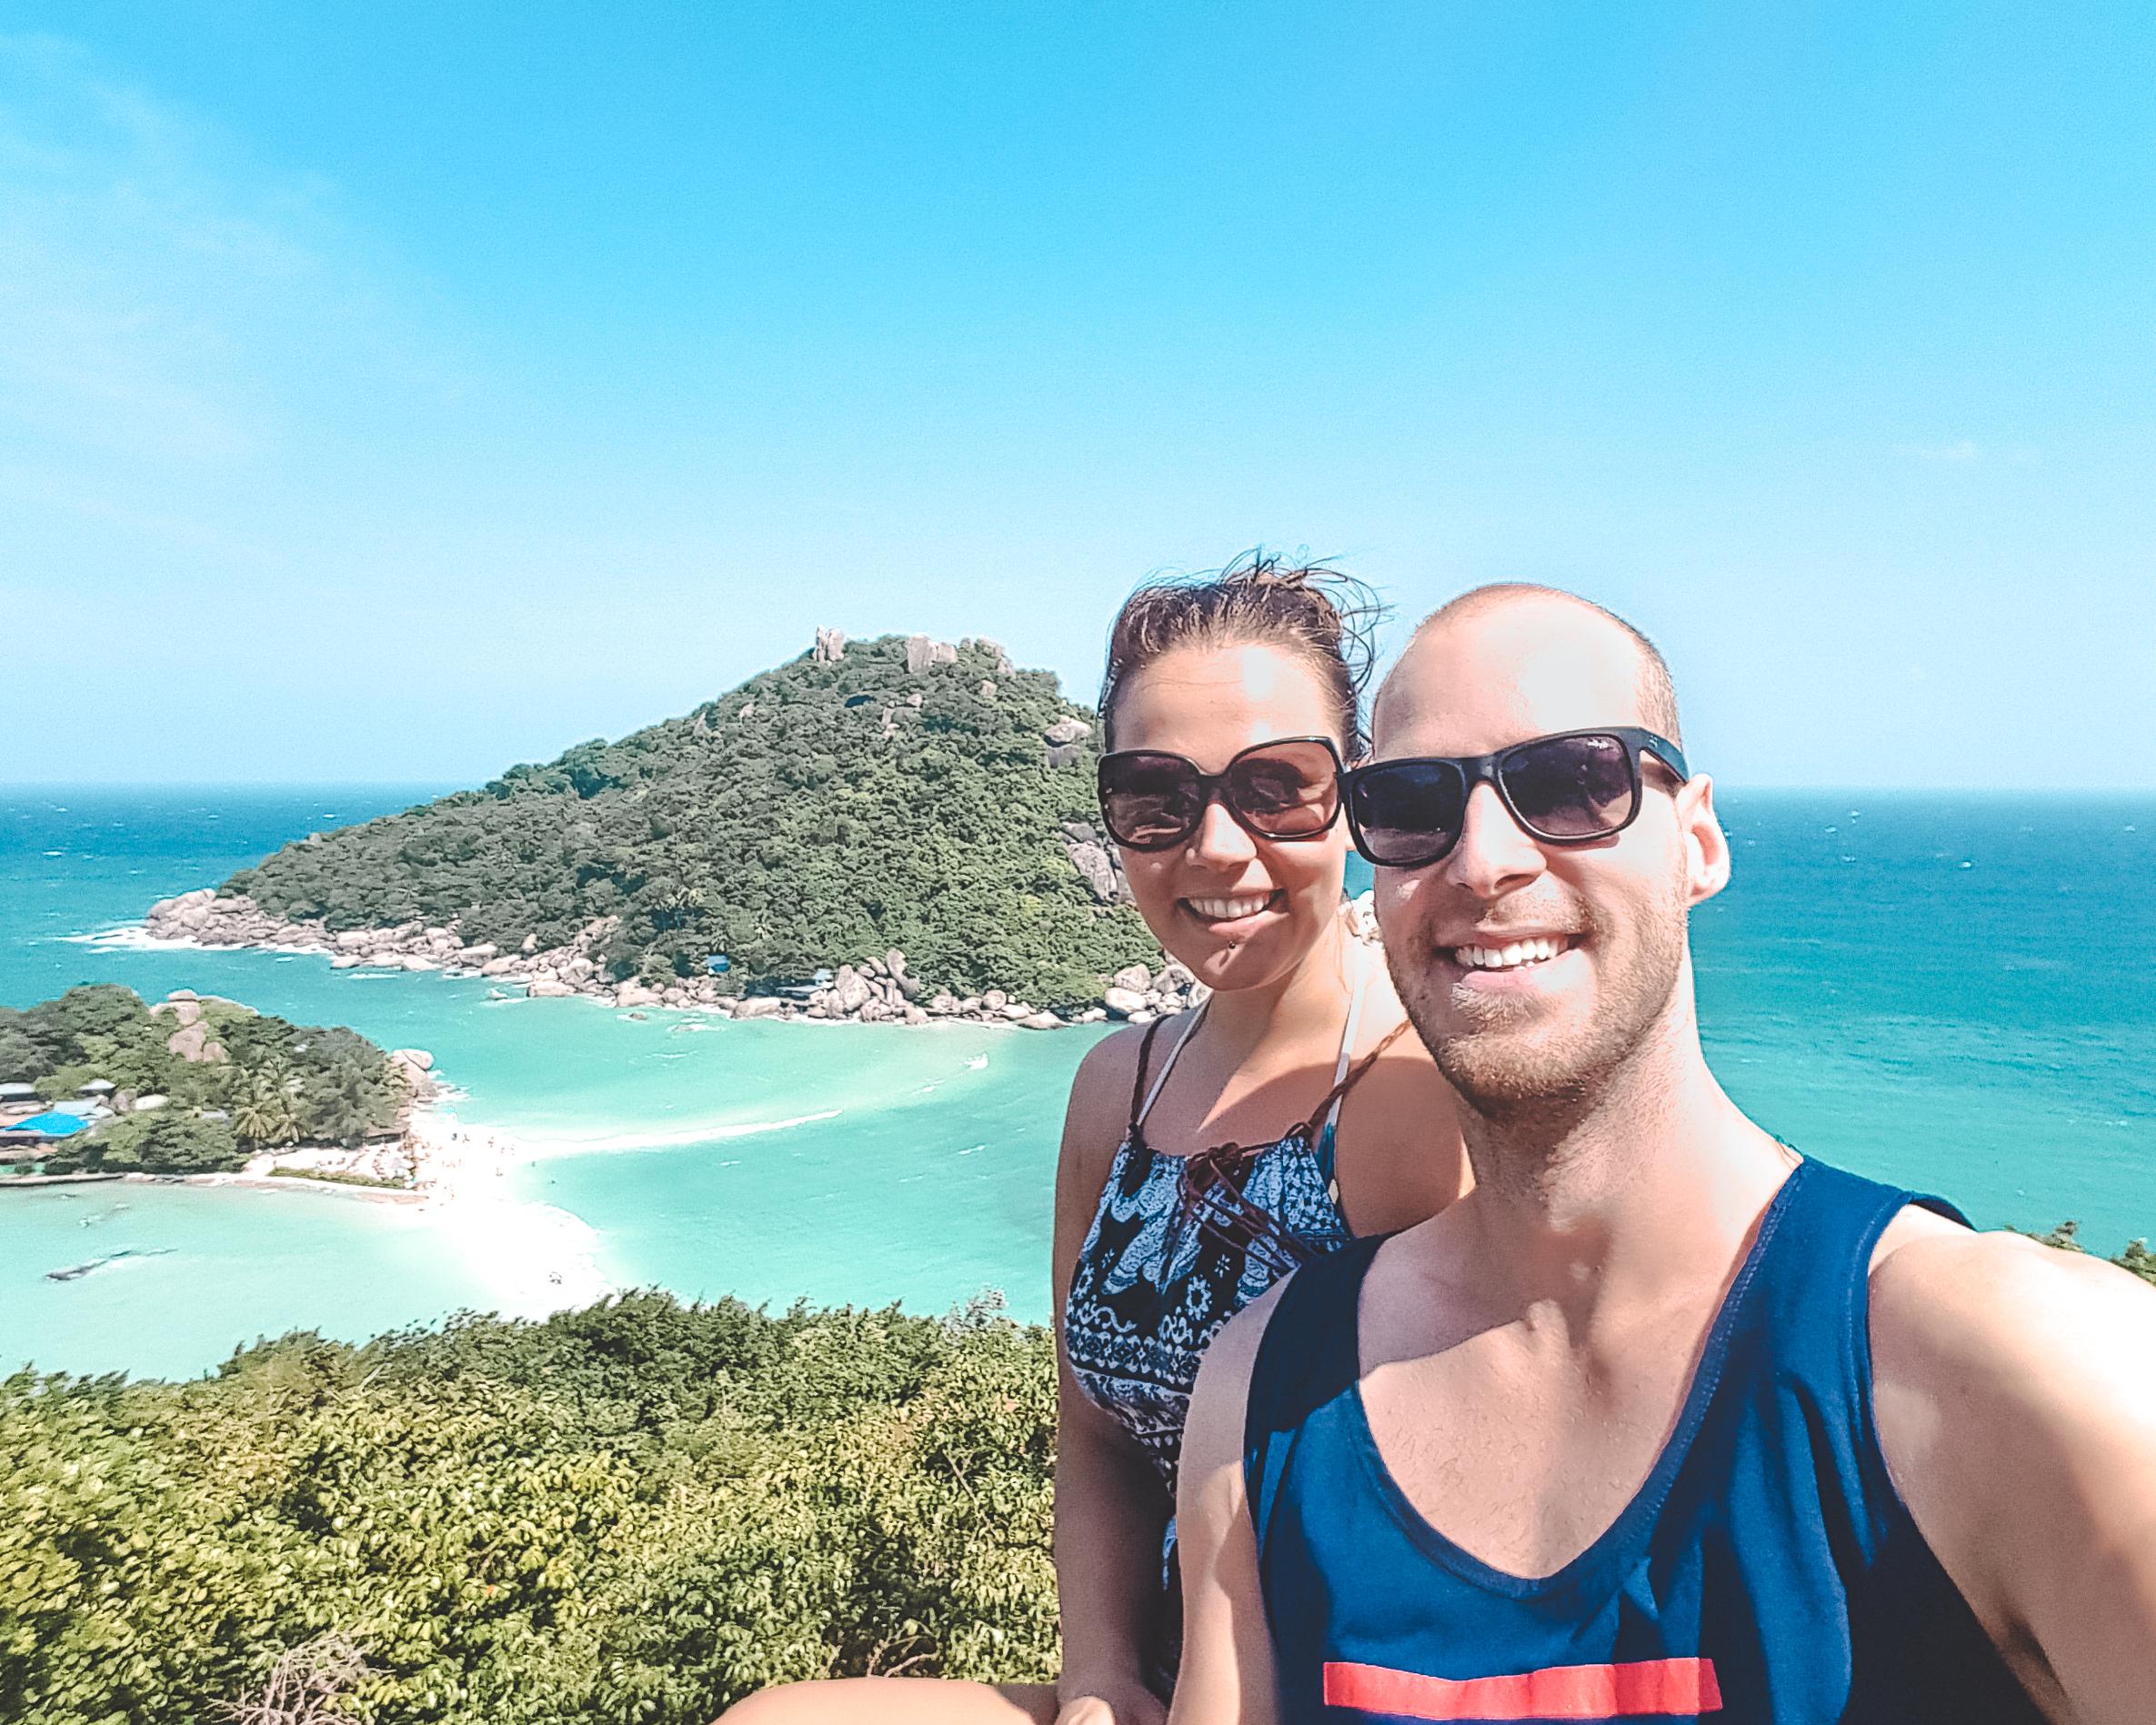 Craving Adventure - Thailand - Koh Nang Yuan - Island -  Travel - Adventure - Couple - Beach - Summer - Love - Blog